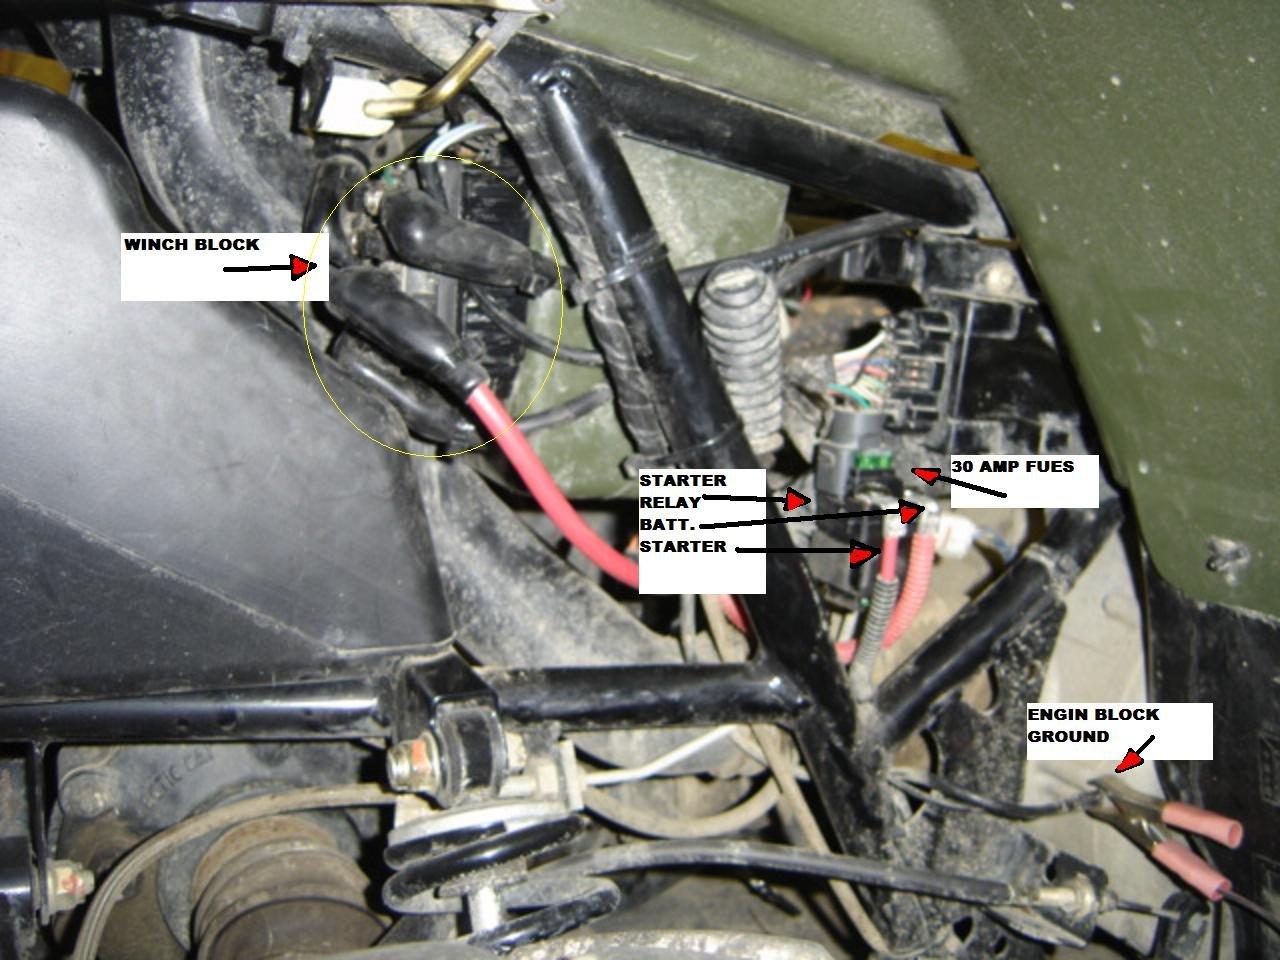 honda 2000 atv winch wiring diagram starter relay no power after it  400 atv arctic cat forum  starter relay no power after it  400